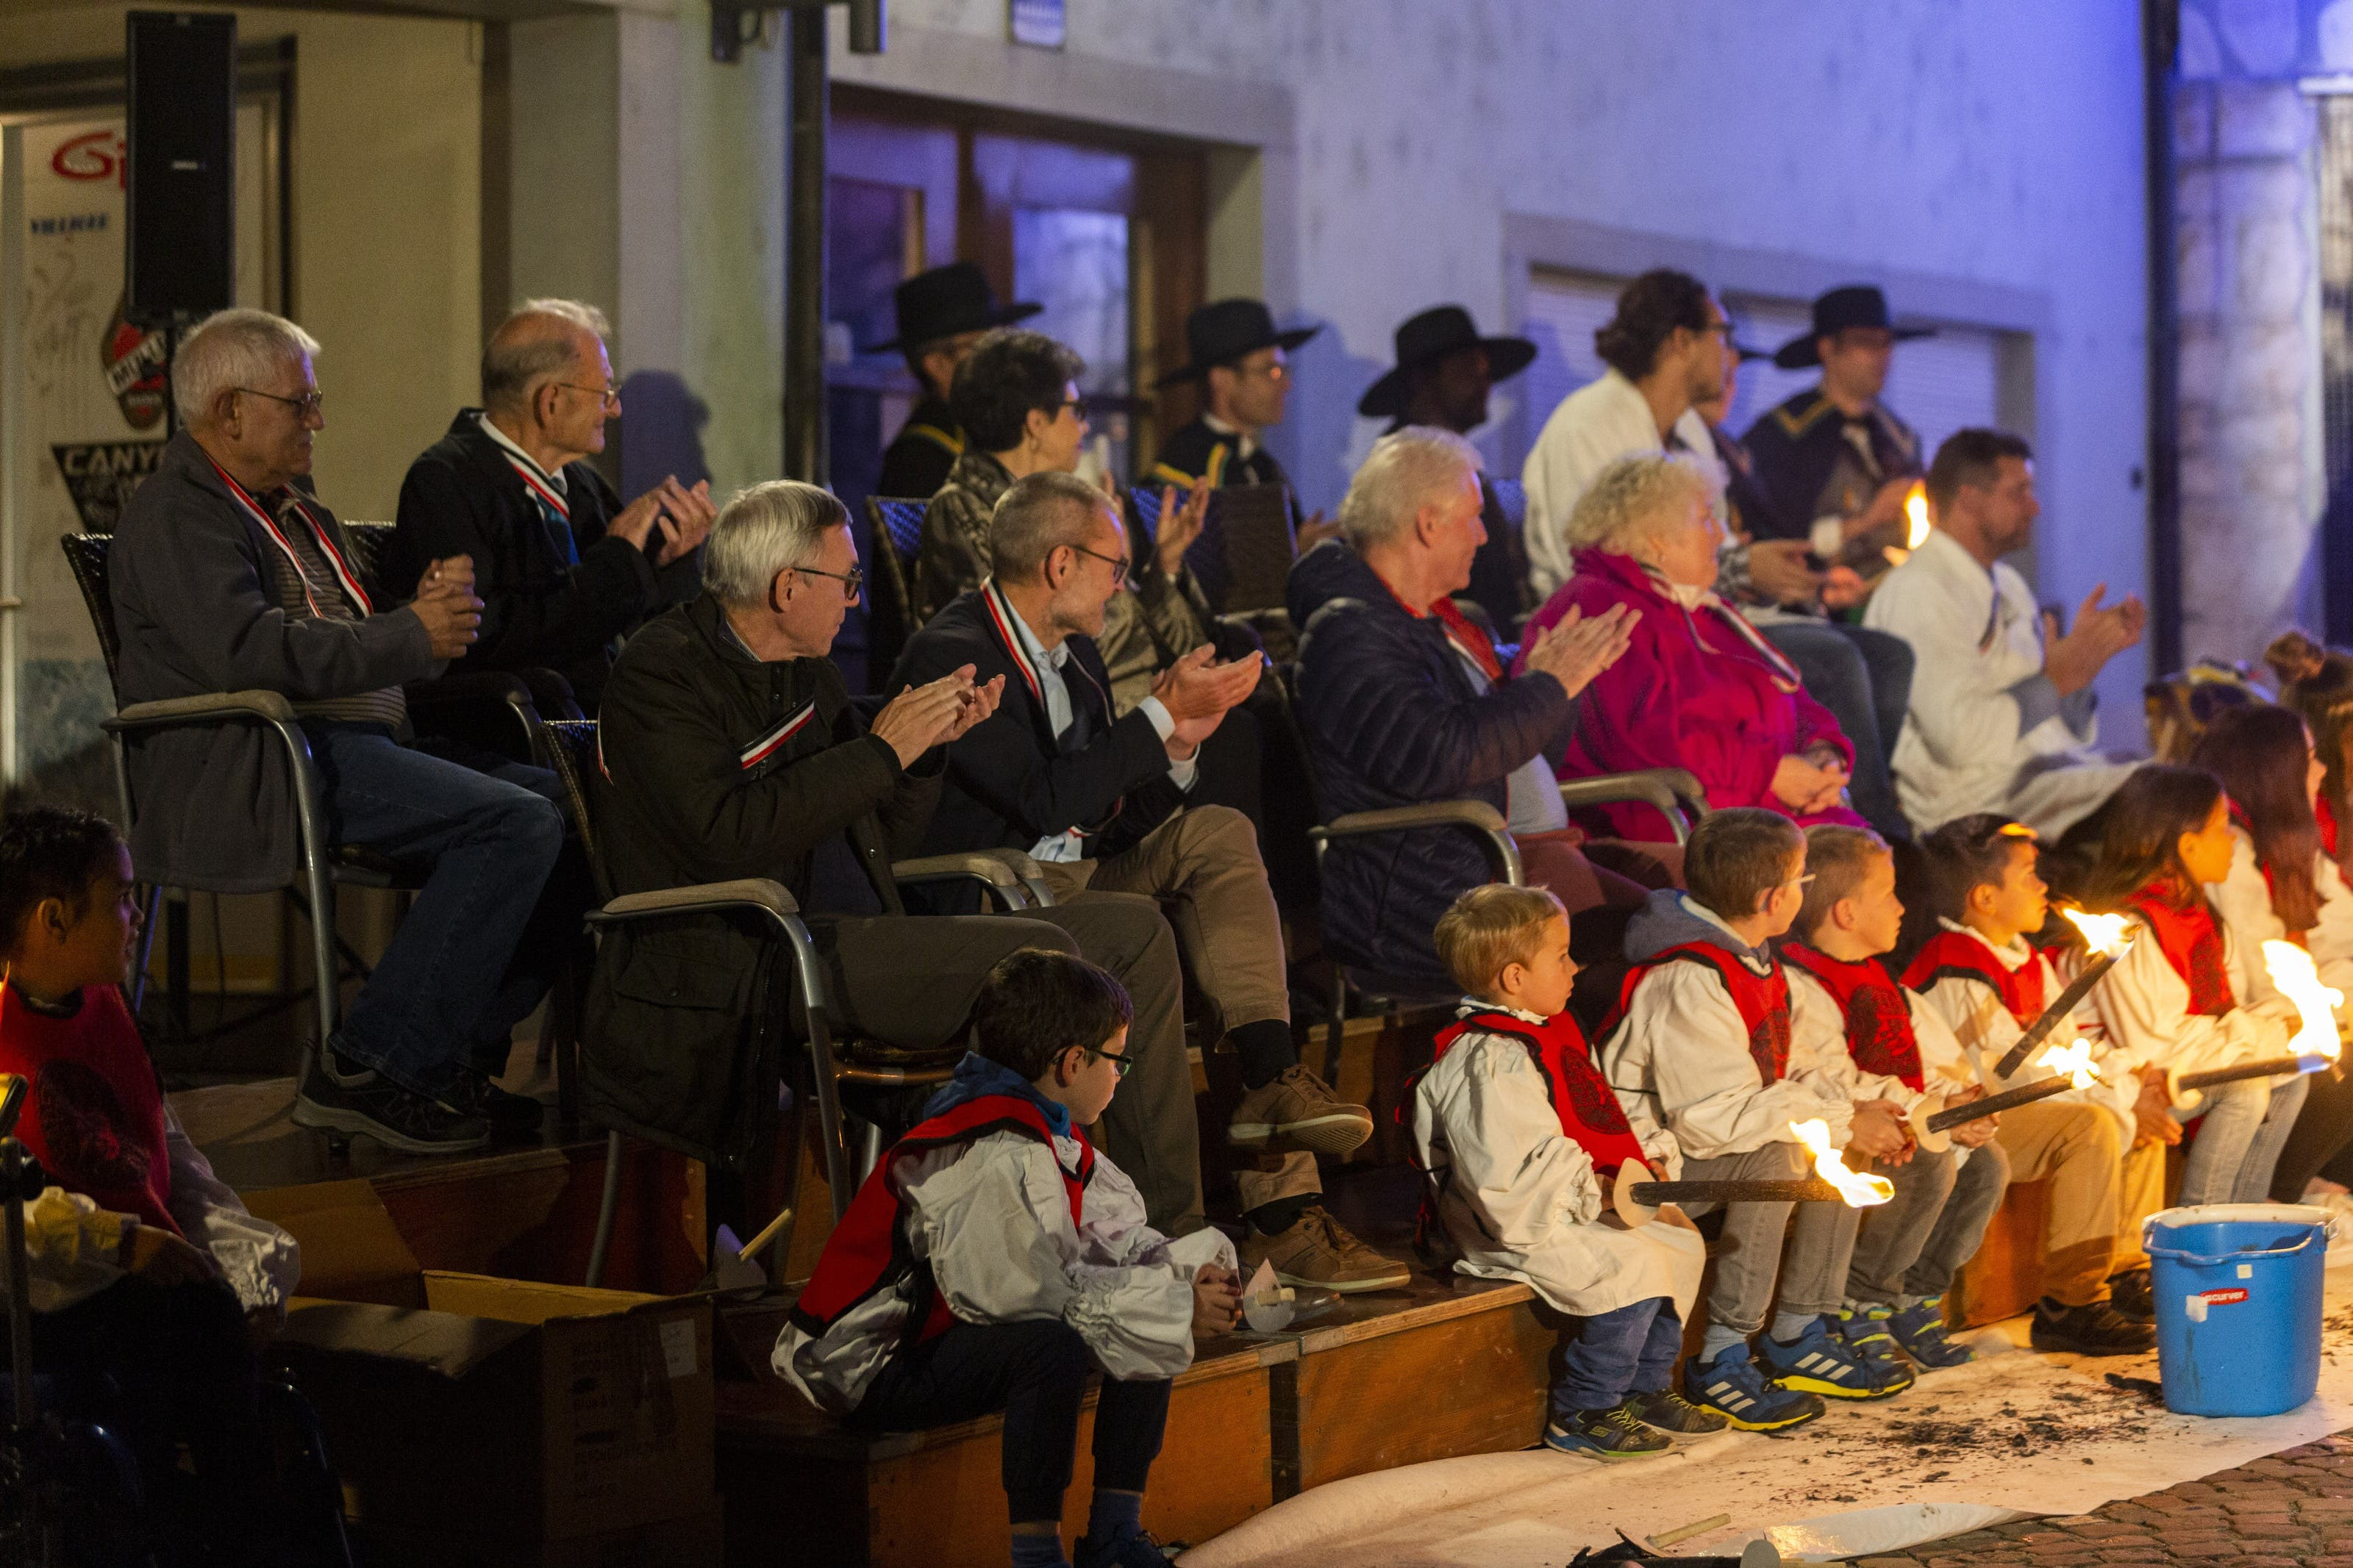 Cordulafeier der Spanischbrödlizunft Baden, am 23. Oktober 2019.